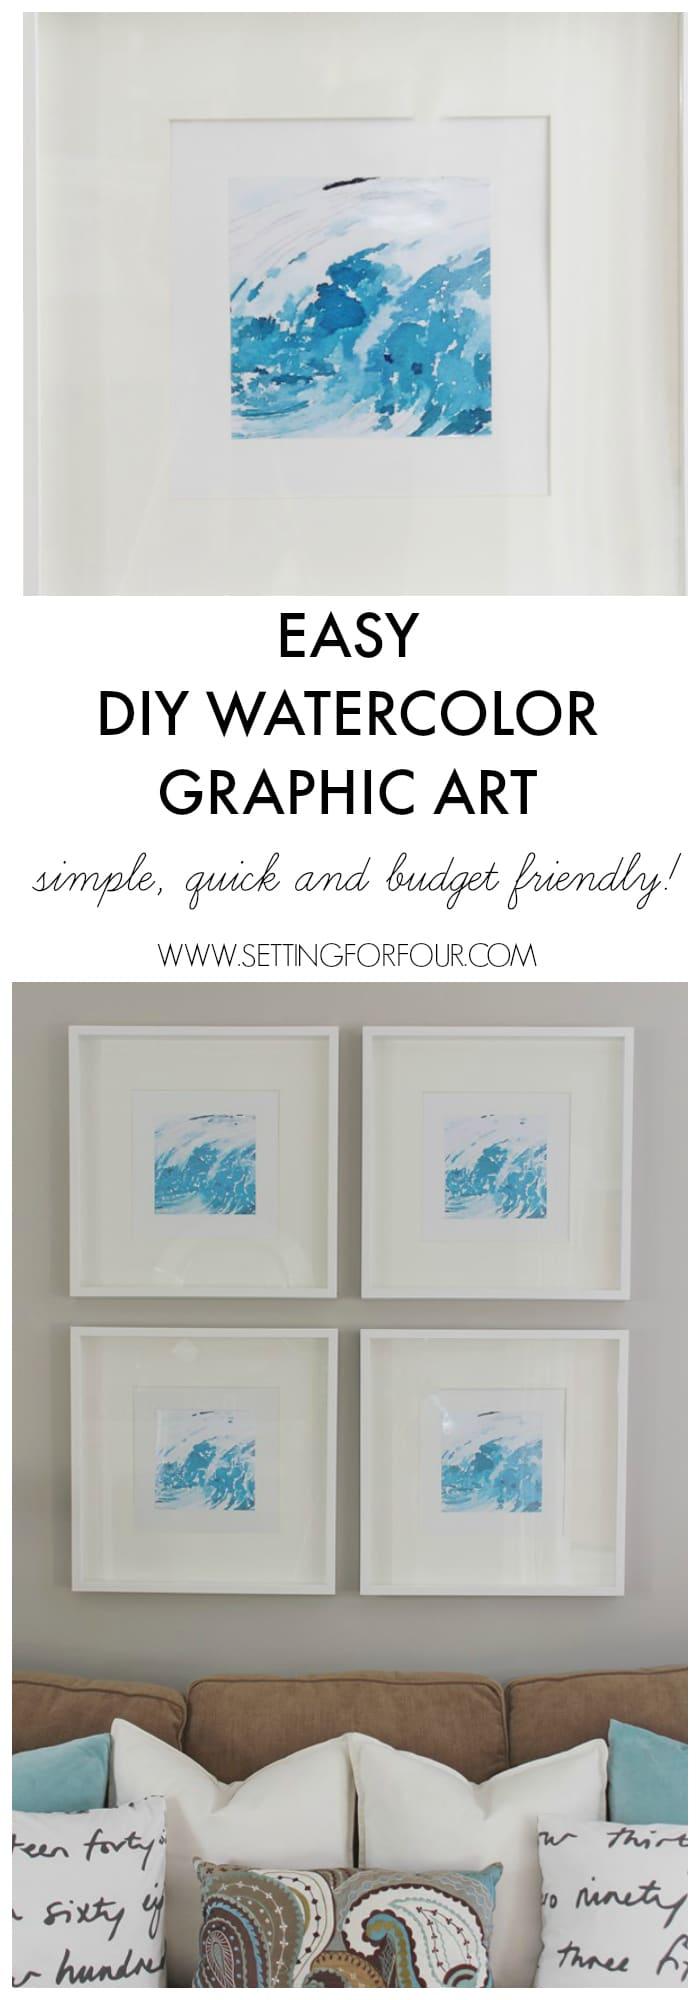 Easy DIY Watercolor Graphic Wall Art | www.settingforfour.com